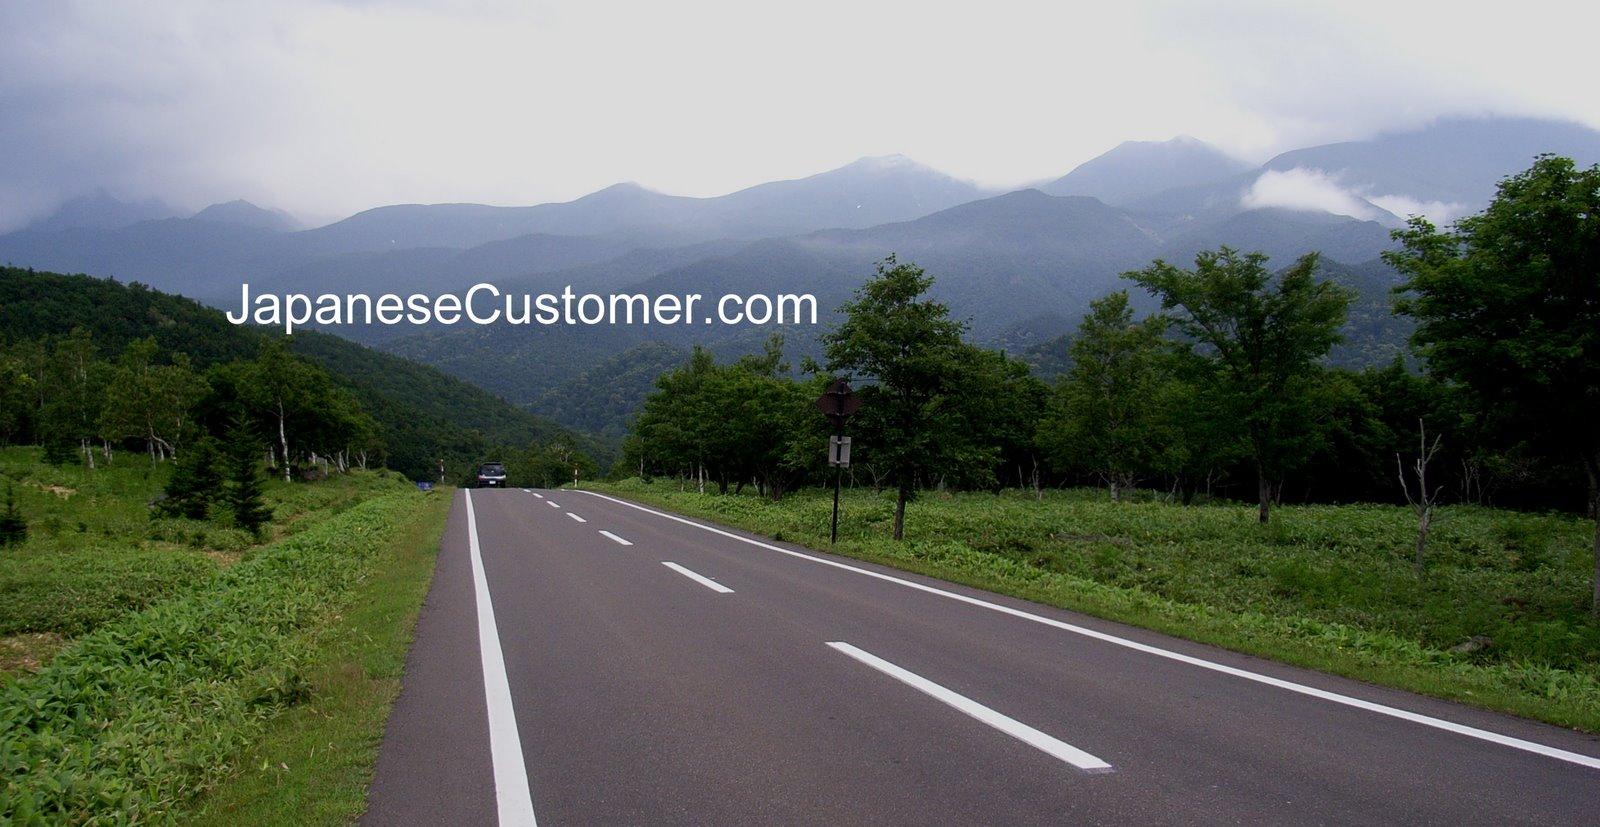 Highway in Japan Copyright Peter Hanami 2014